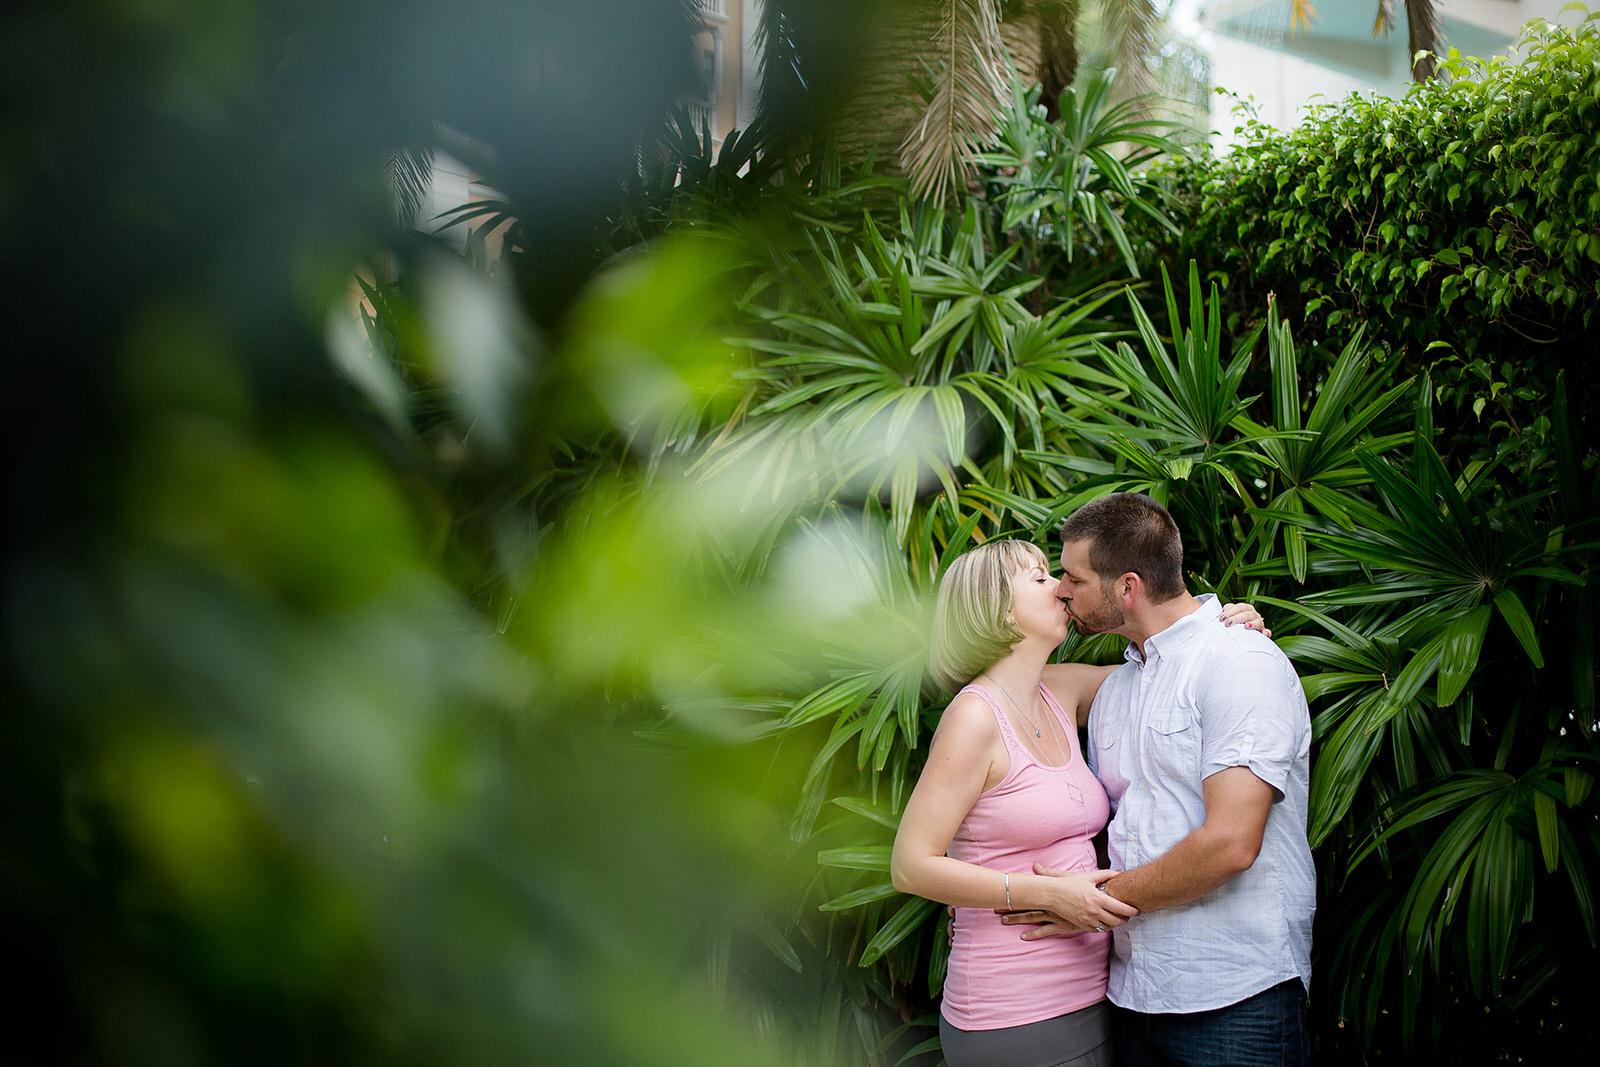 miami-biltmore-engagement-session-portraits-love-couple-fun-cute-emotional.jpg